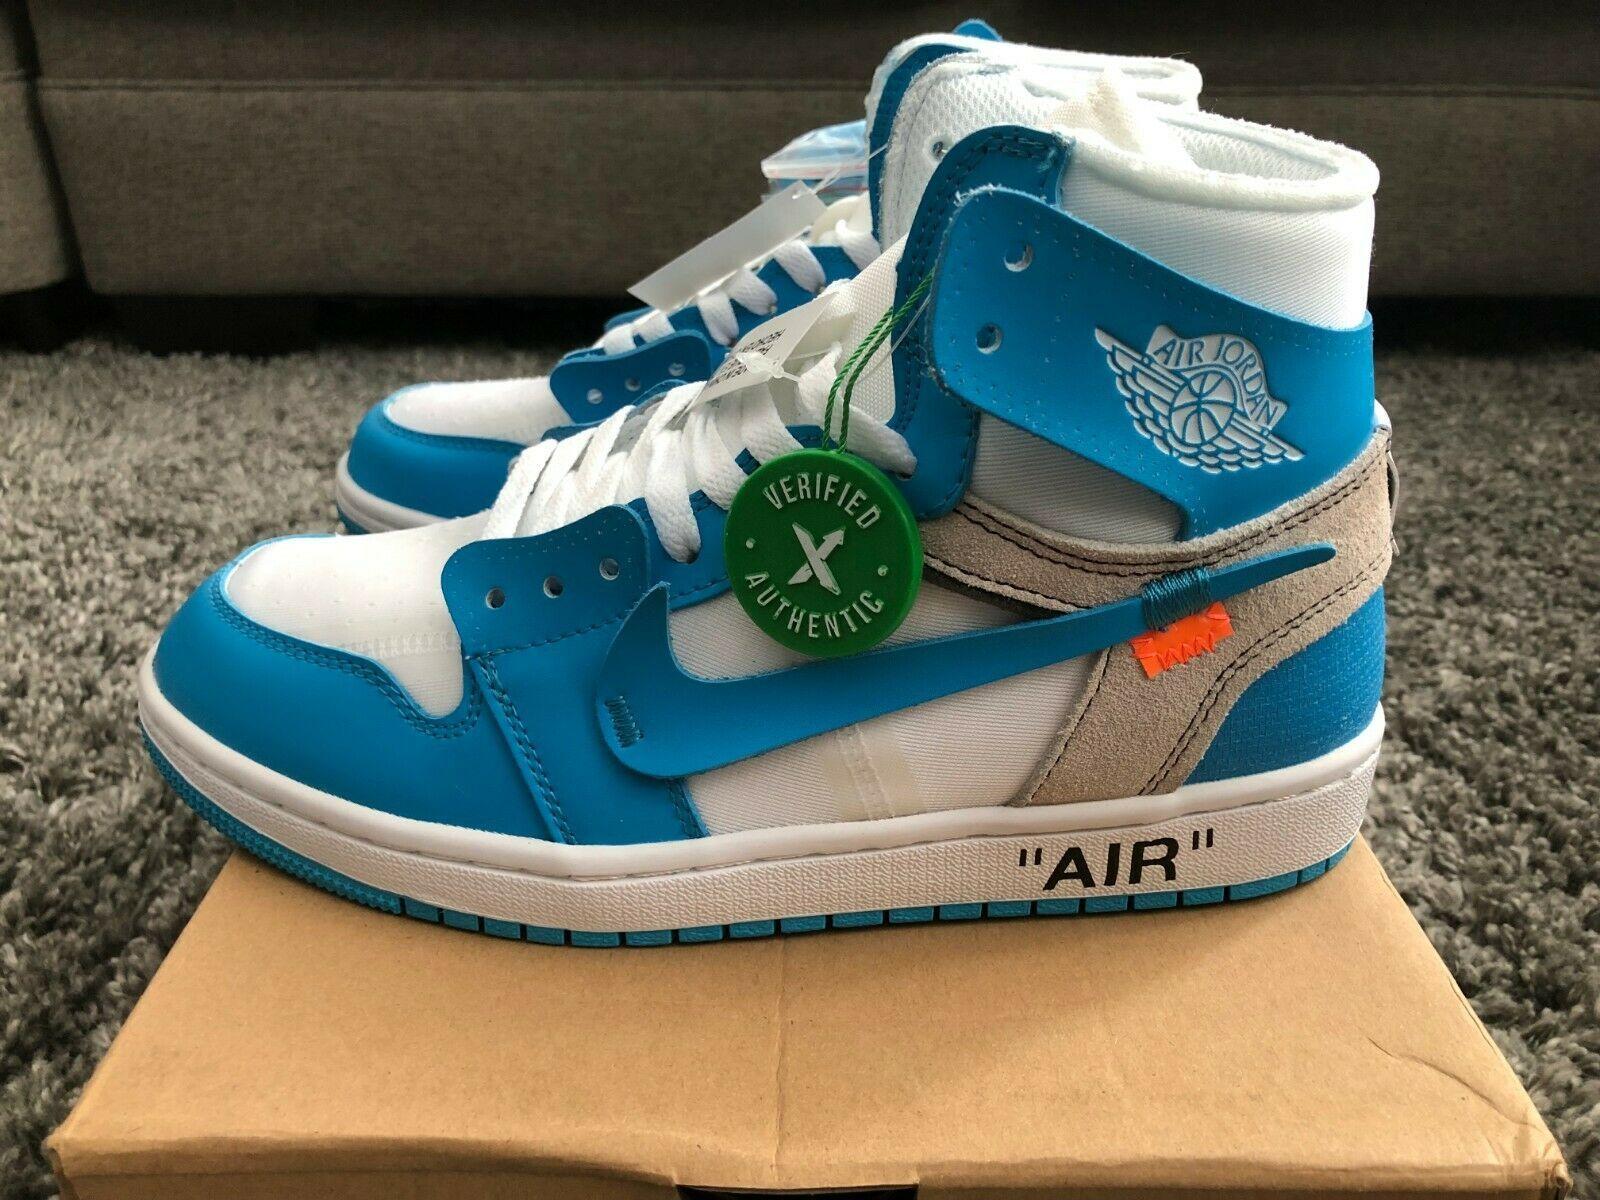 Introducir Sofisticado facultativo  Air Jordan Men's Jordan 1 Retro High UNC 'Off White StockX Verified Men's  Size 9.5 | Jordans for men, Black casual shoes, Mens nike air